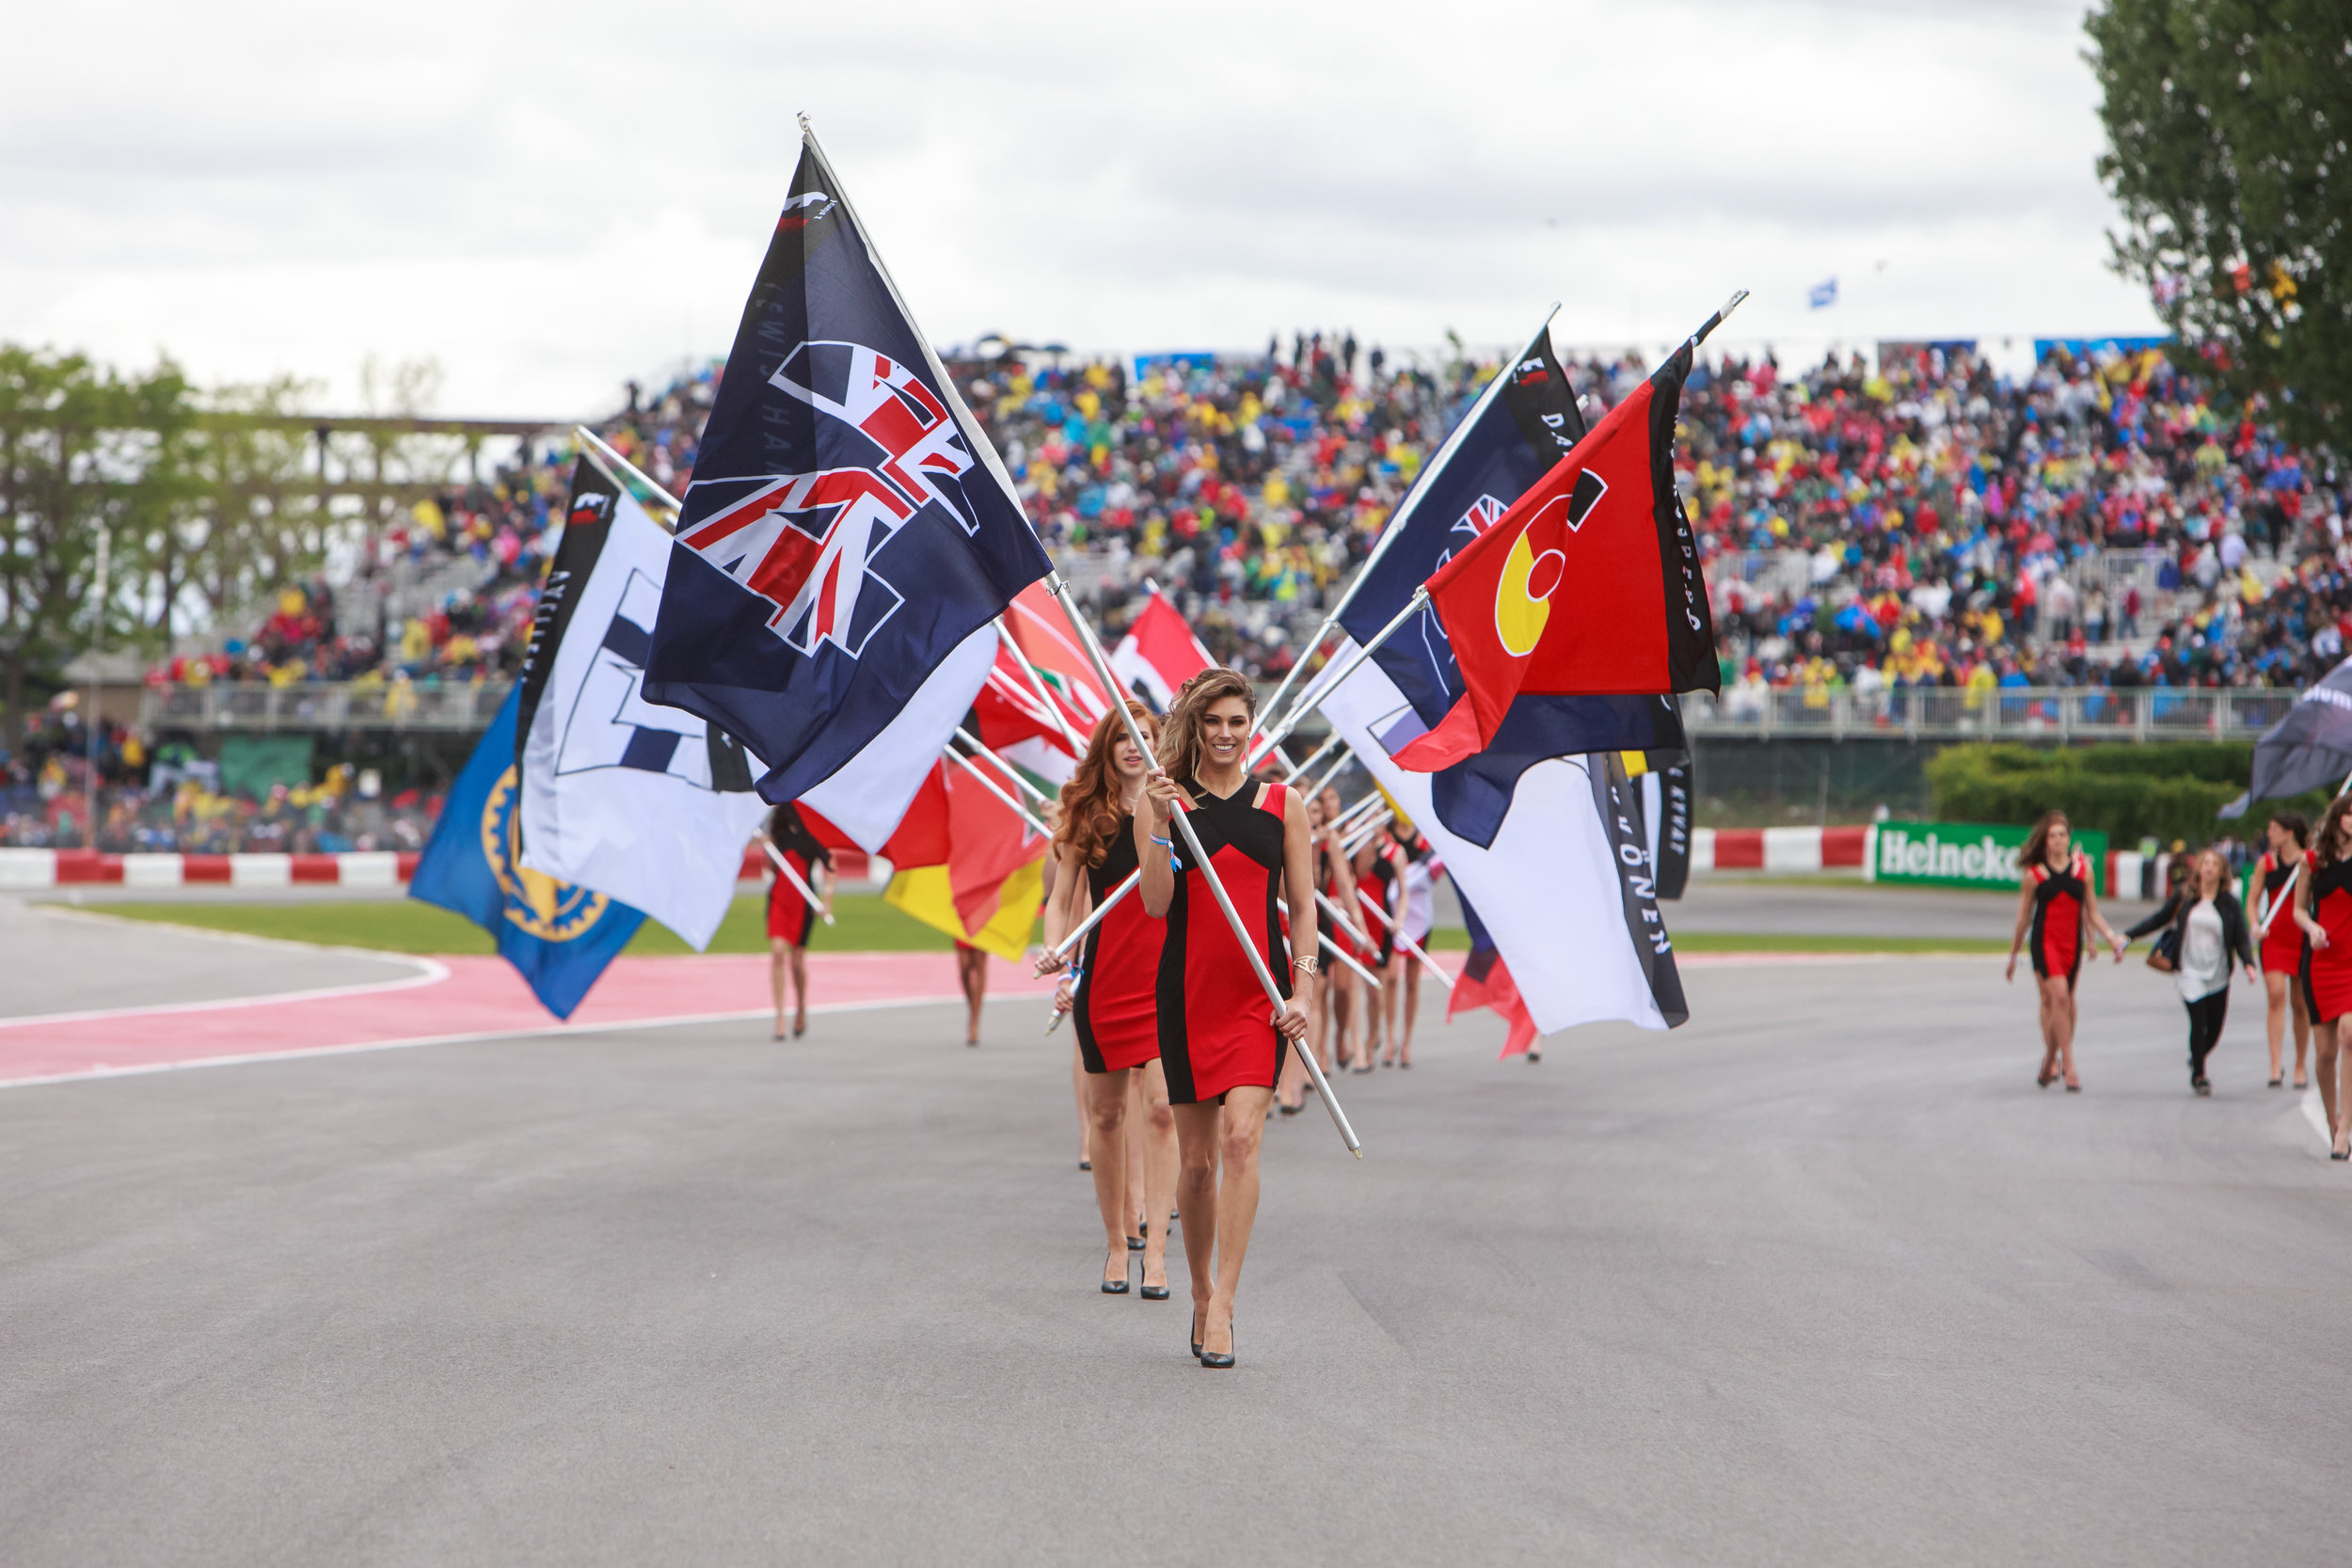 F1 Grand Prinx Canada - Sunday (quick export) - 031 - 20160612-0180.jpg